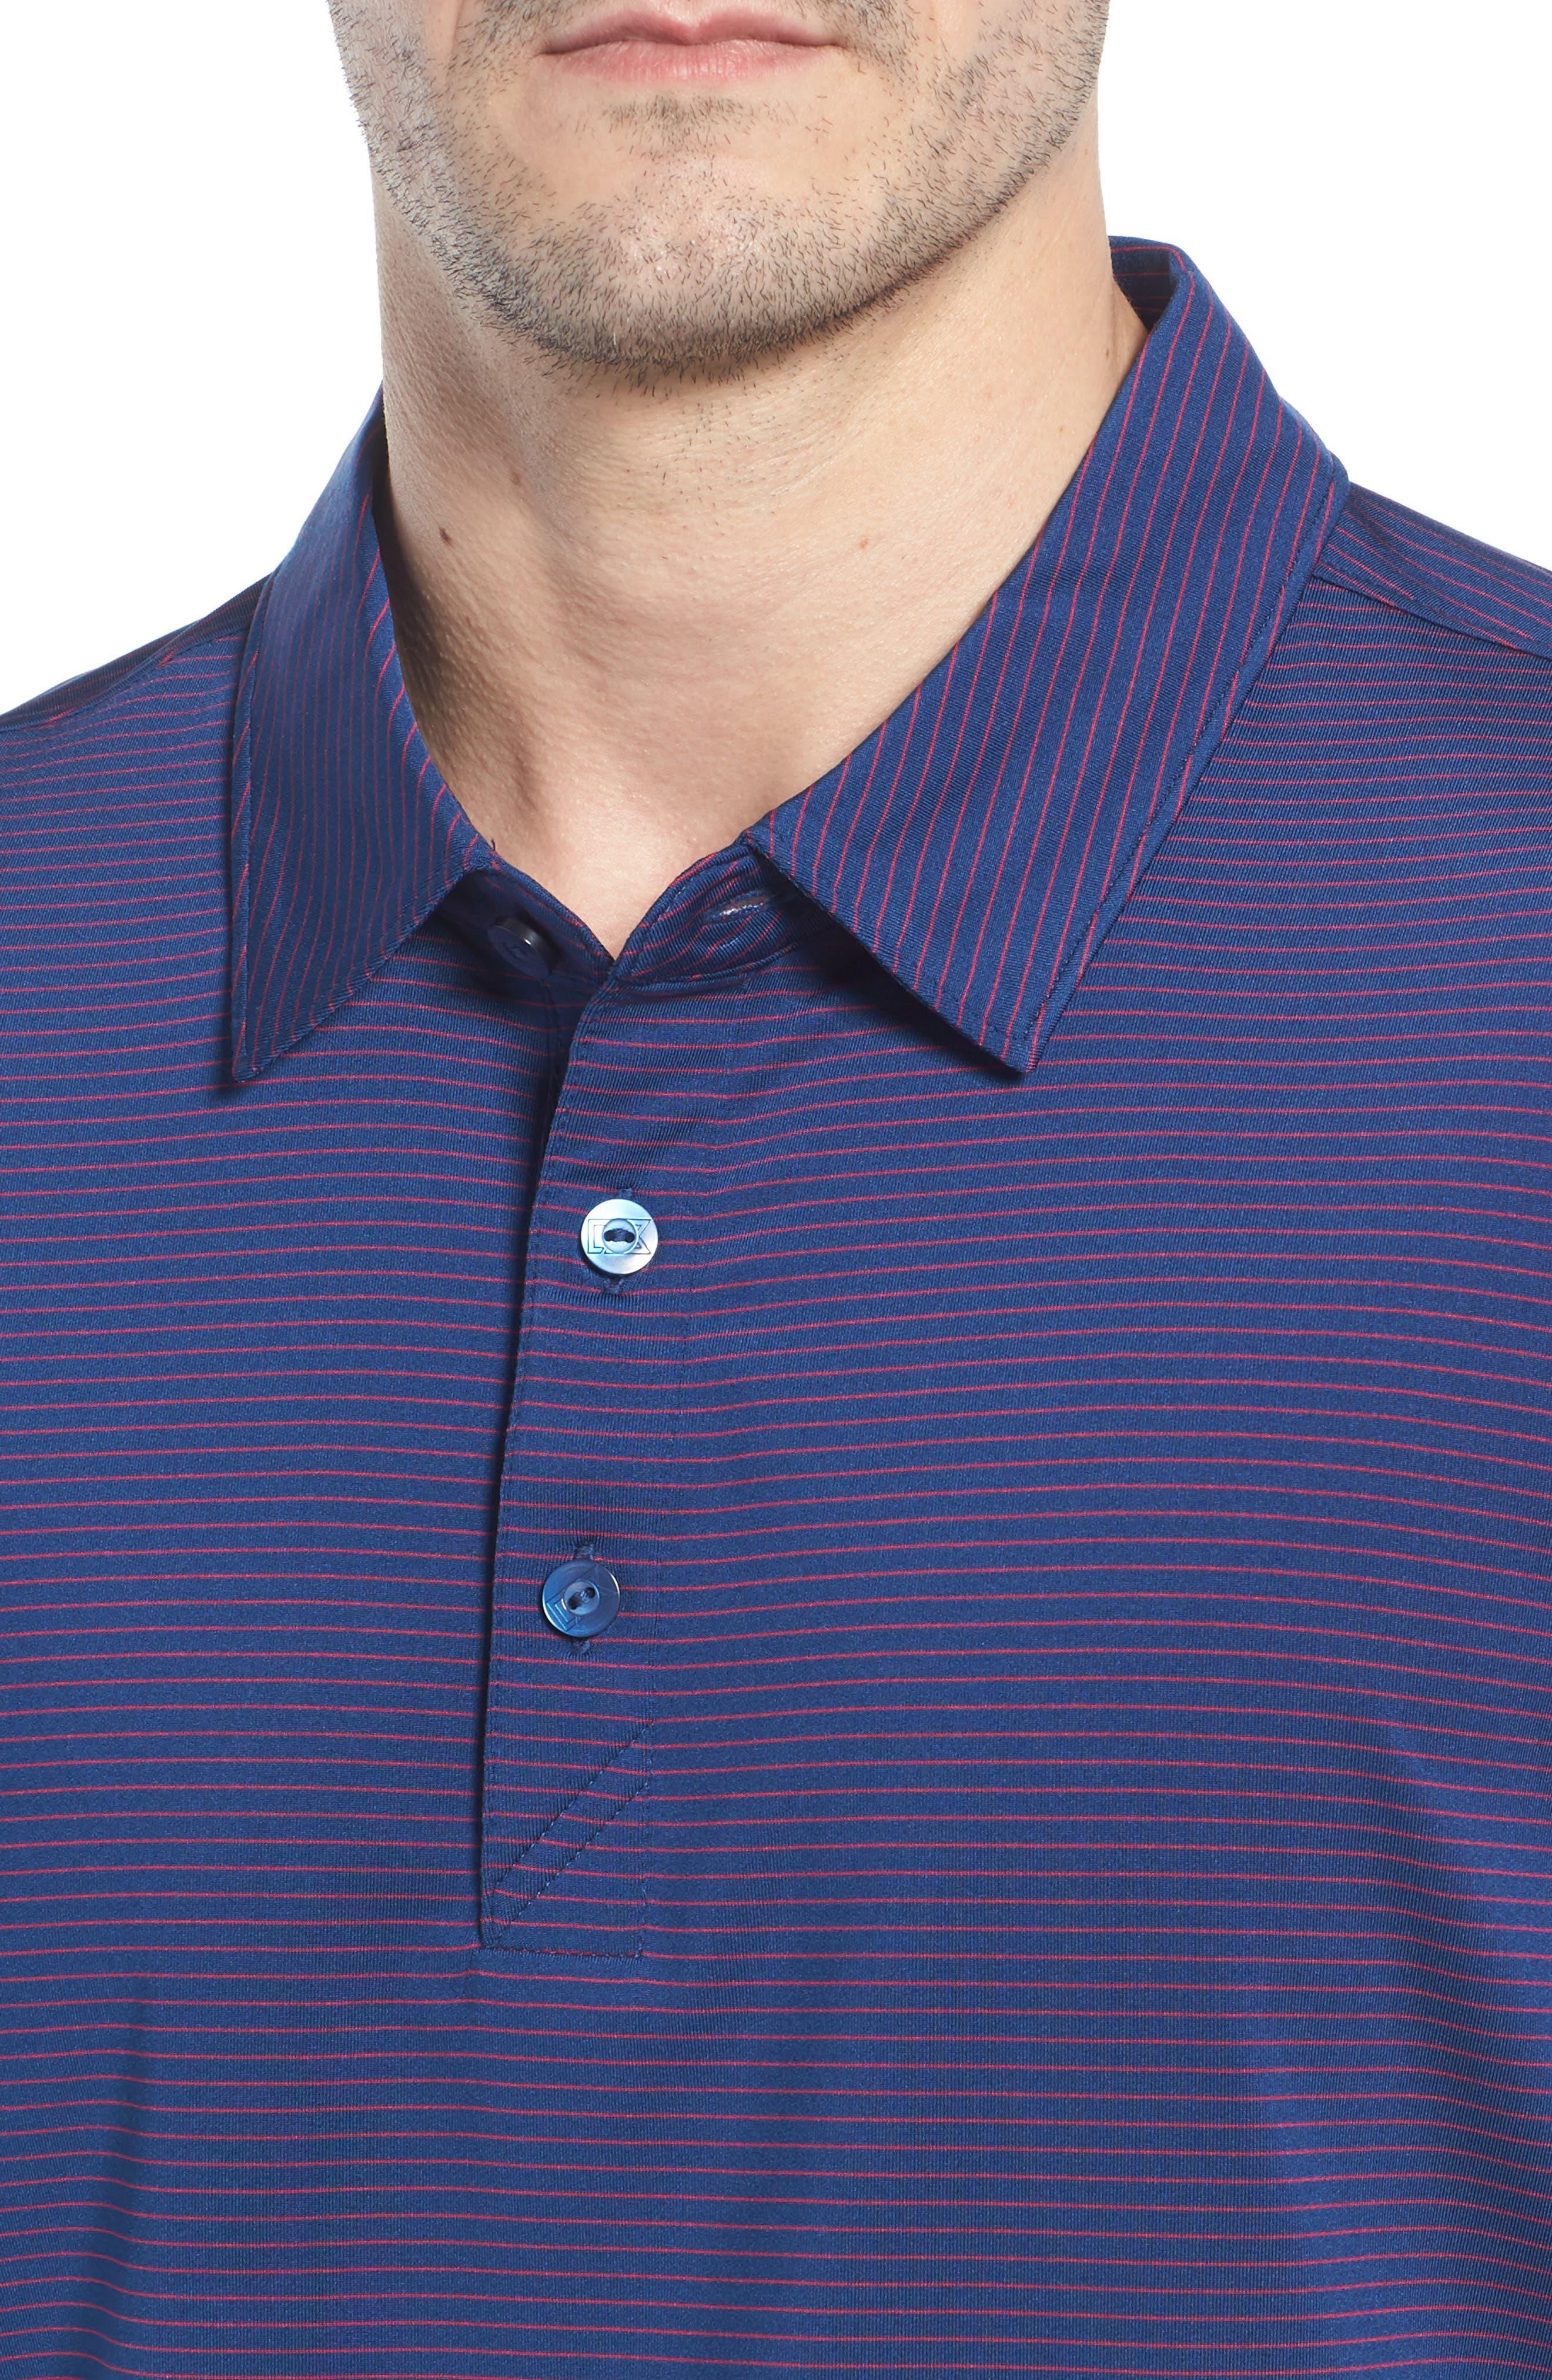 Samish Stripe DryTec Polo,                             Alternate thumbnail 22, color,